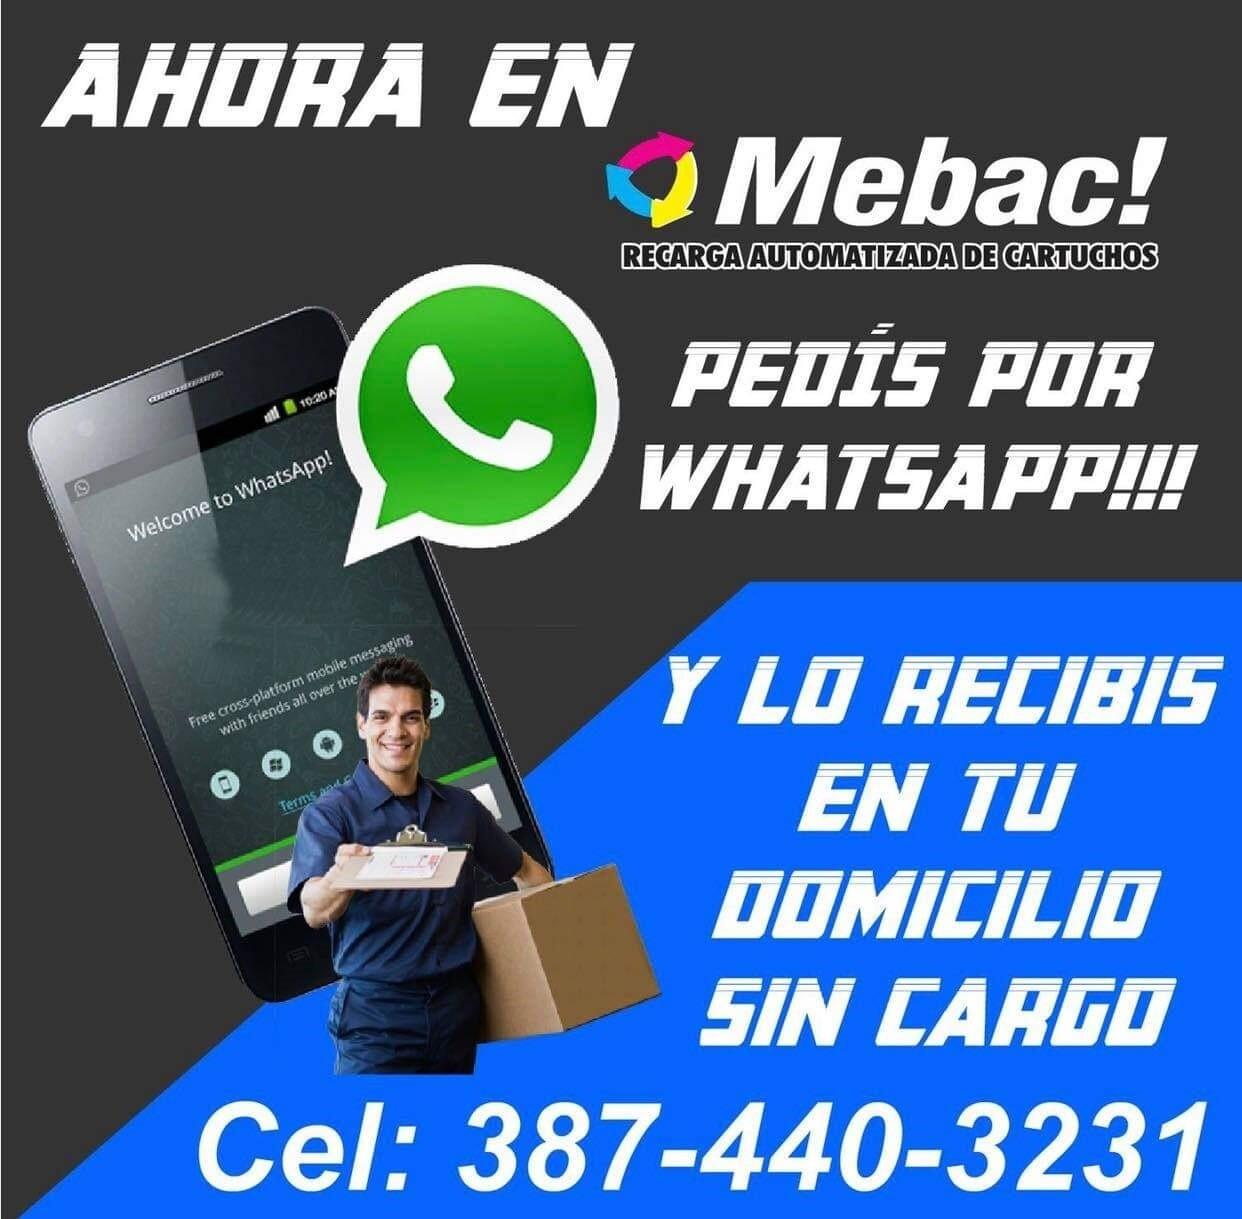 Mebac